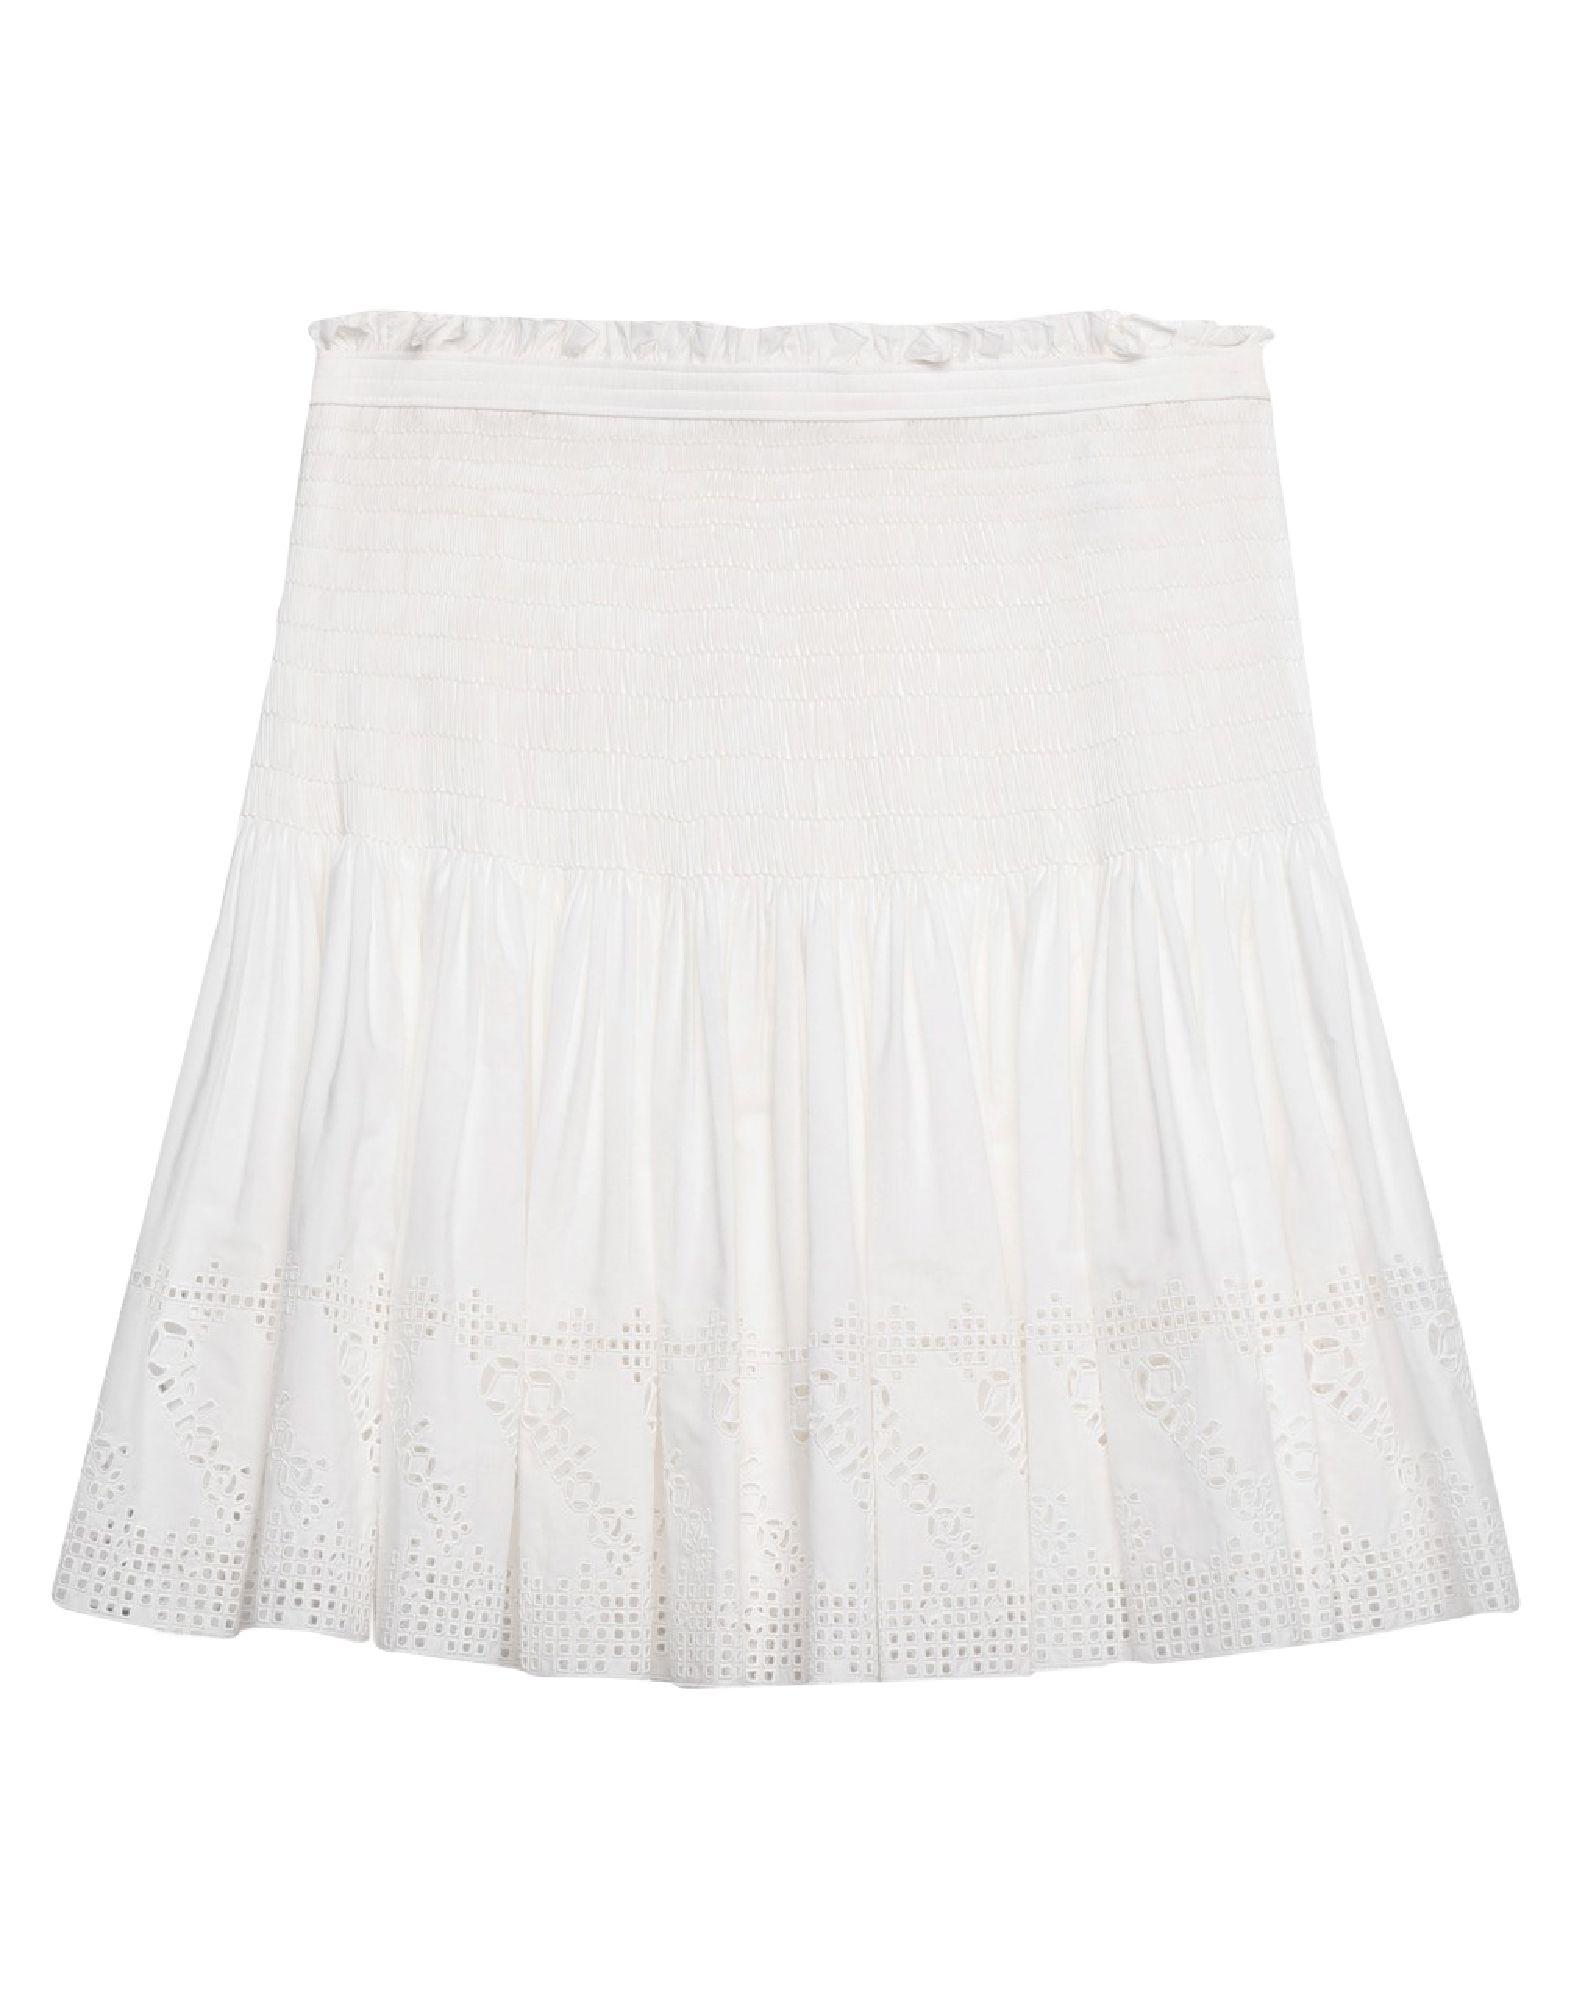 Фото - CHLOÉ Юбка до колена chloé юбка до колена